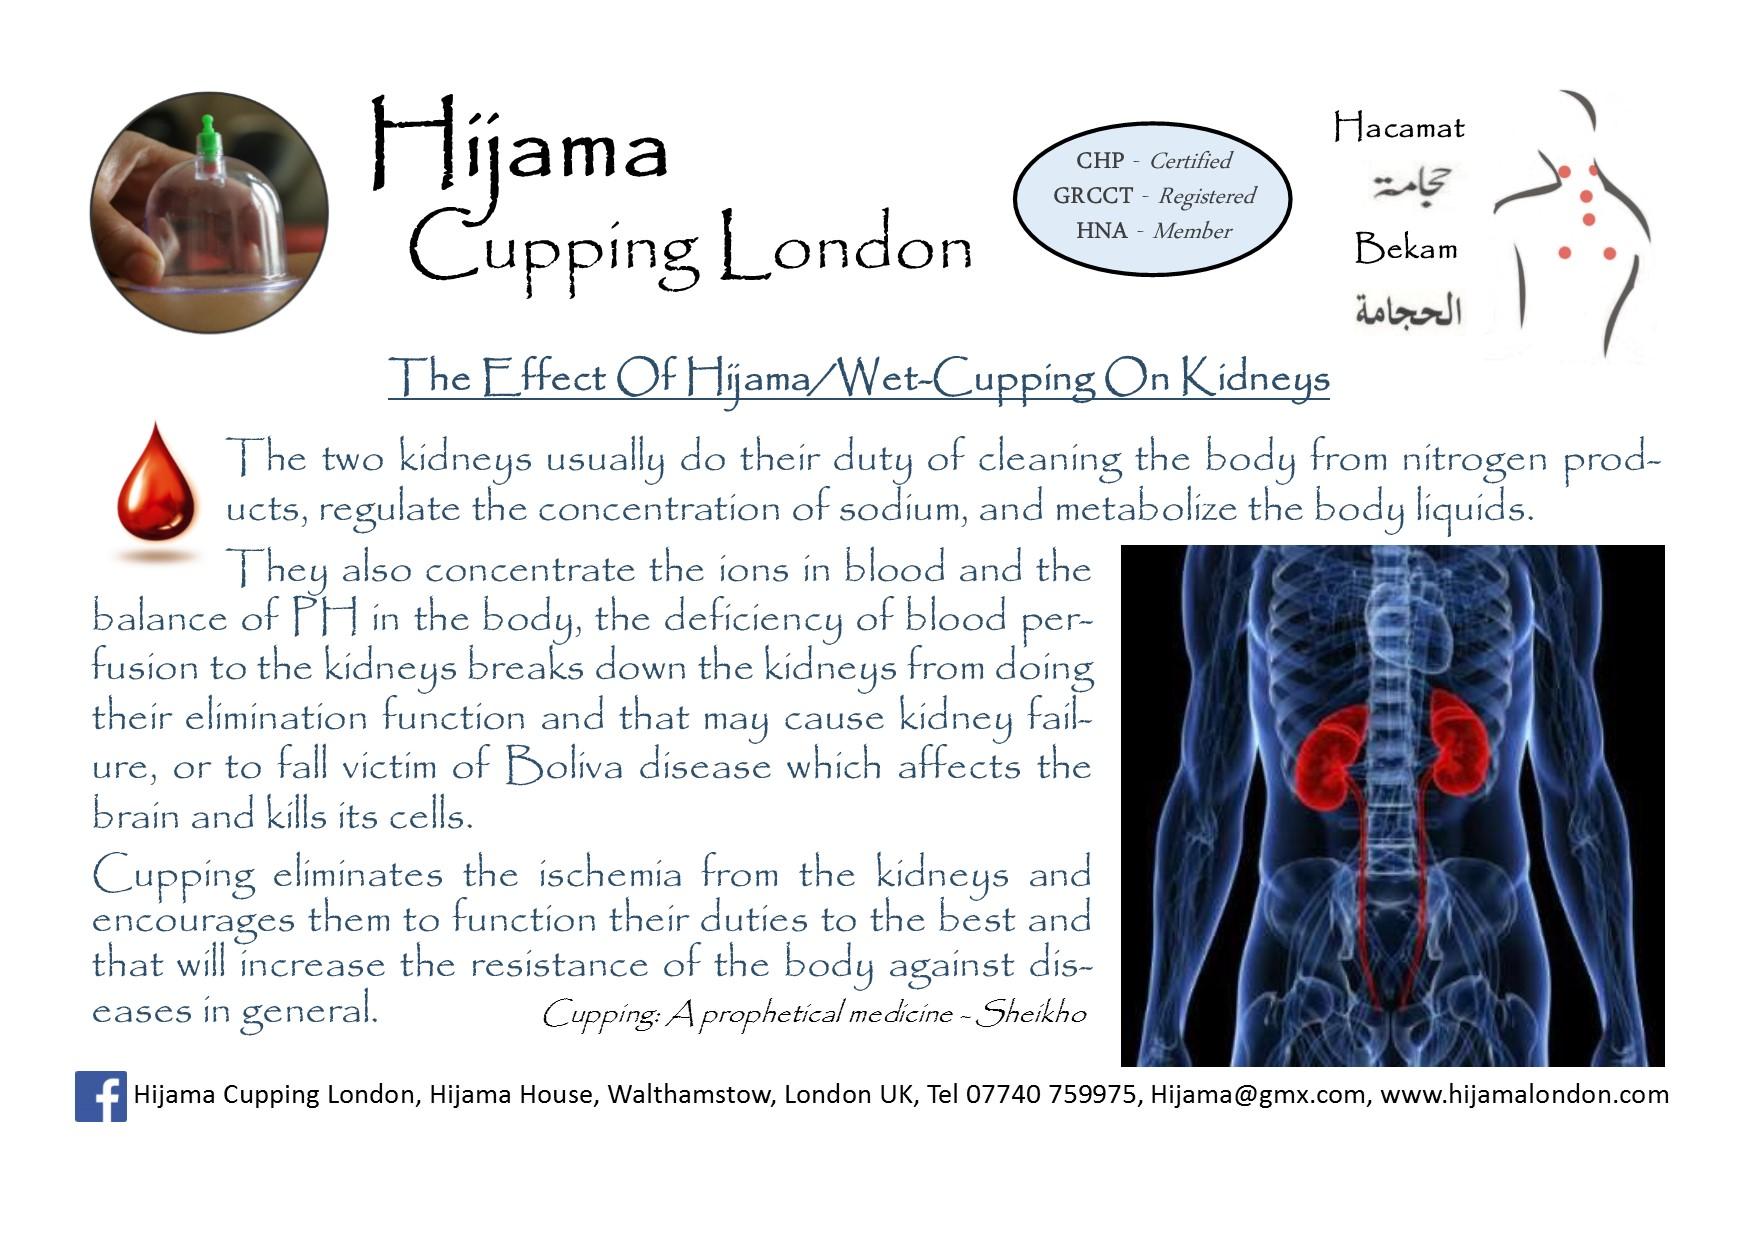 Hijama effects on Kidneys